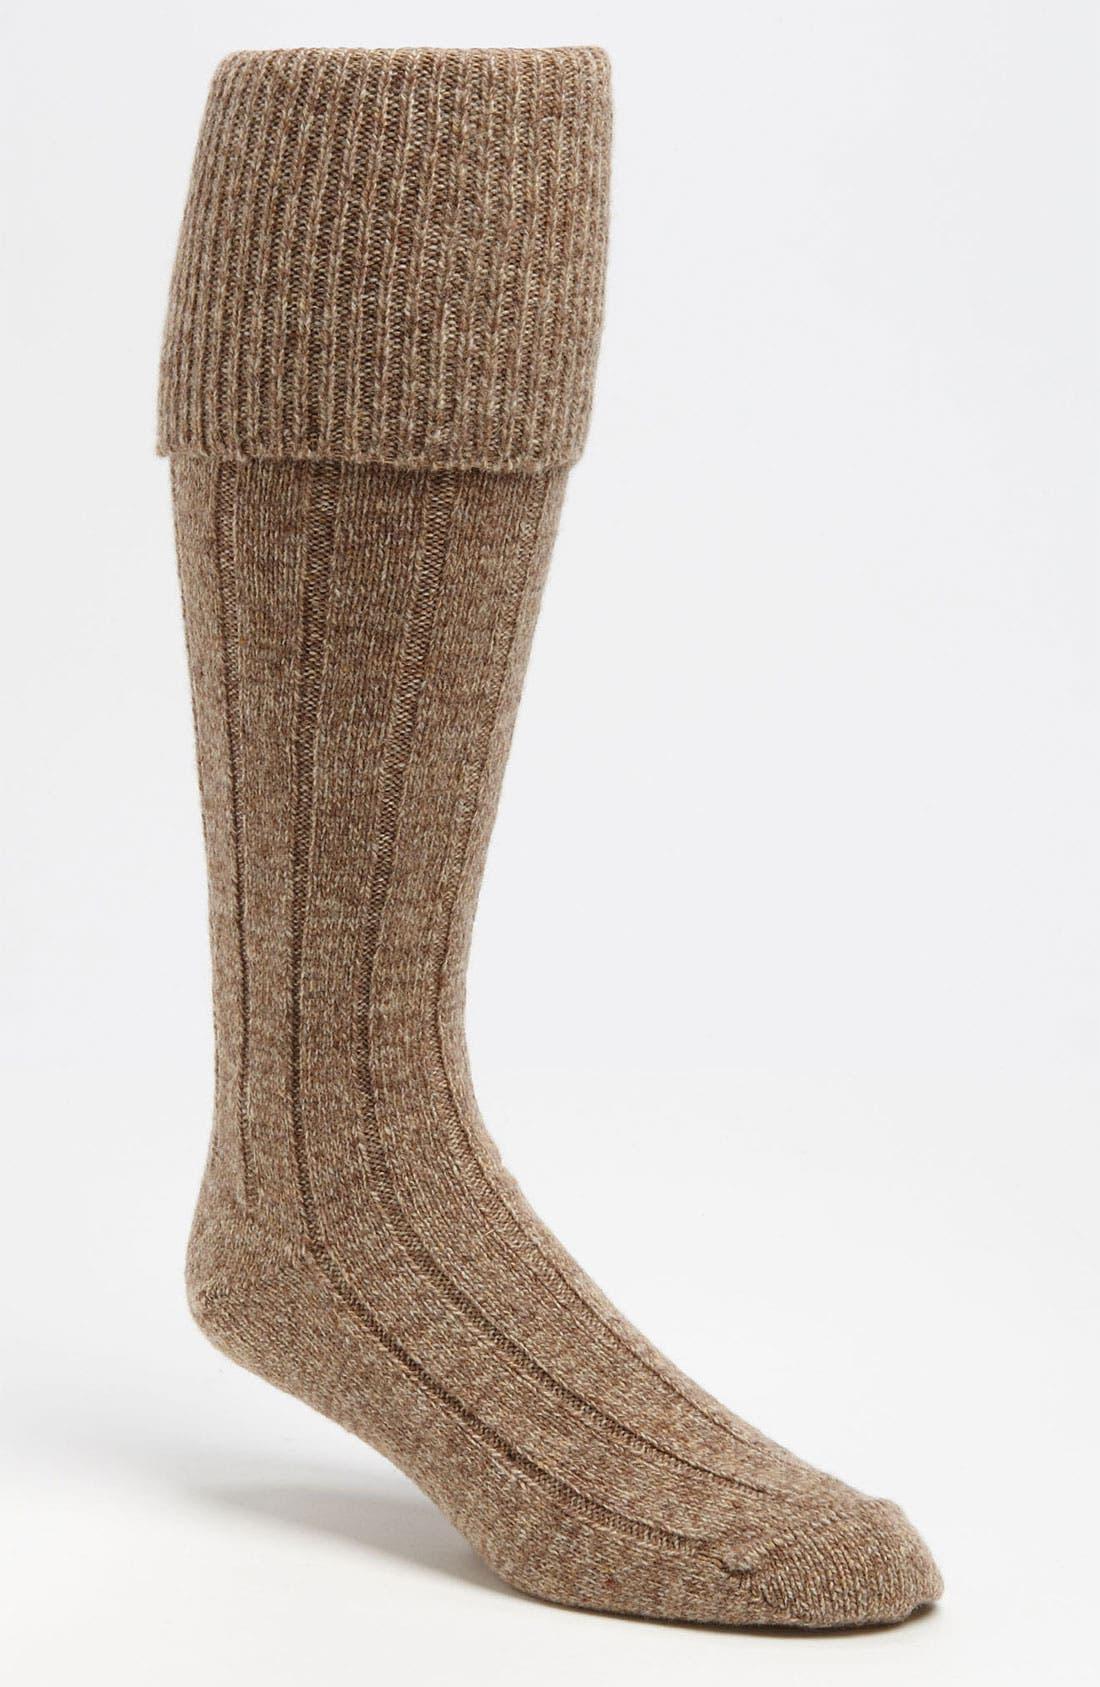 Alternate Image 1 Selected - Scott-Nichol Long Shooting Socks